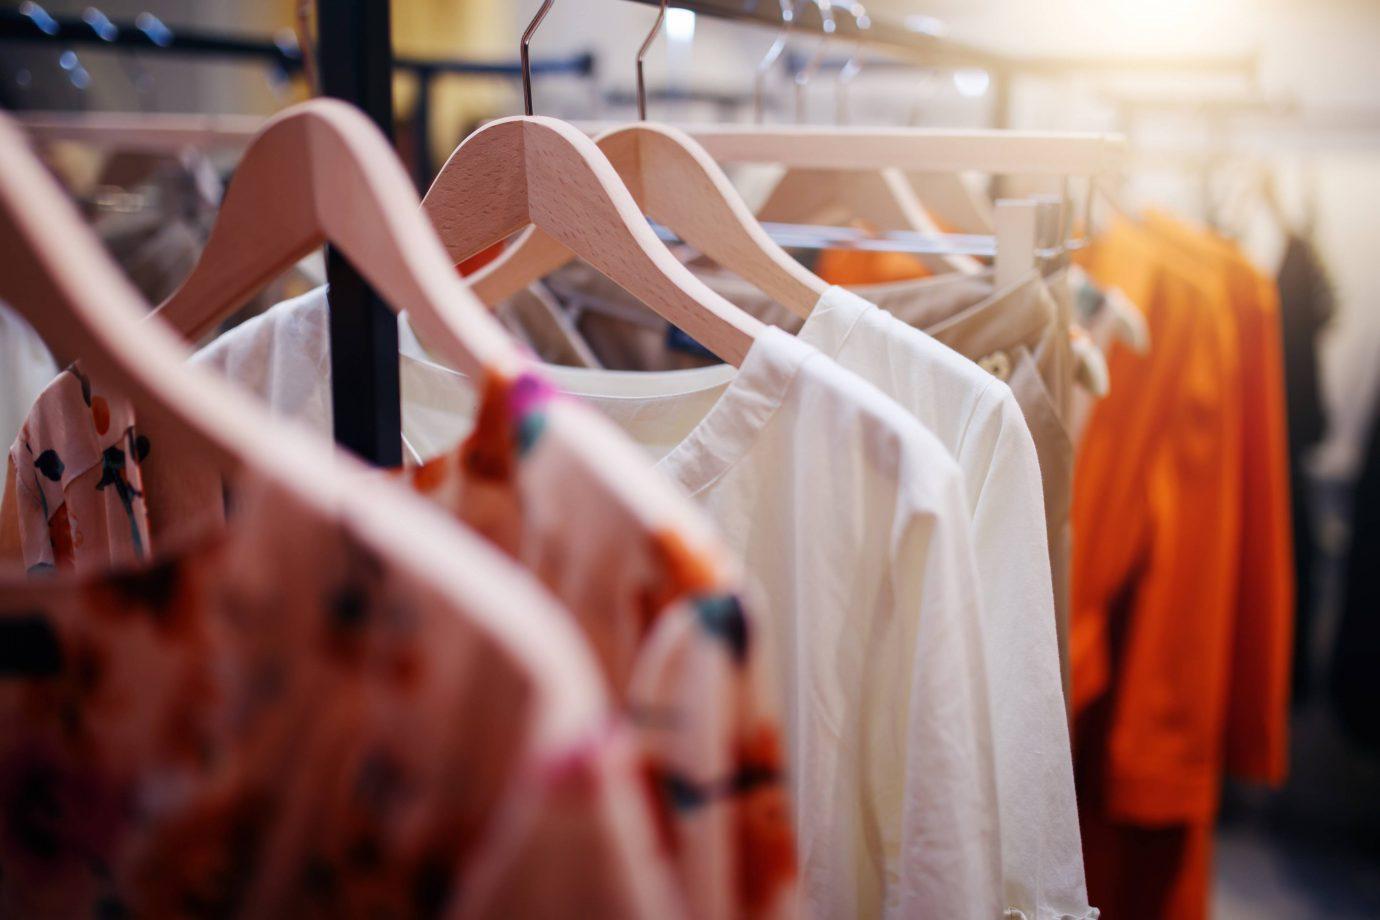 Como renovar o guarda-roupas